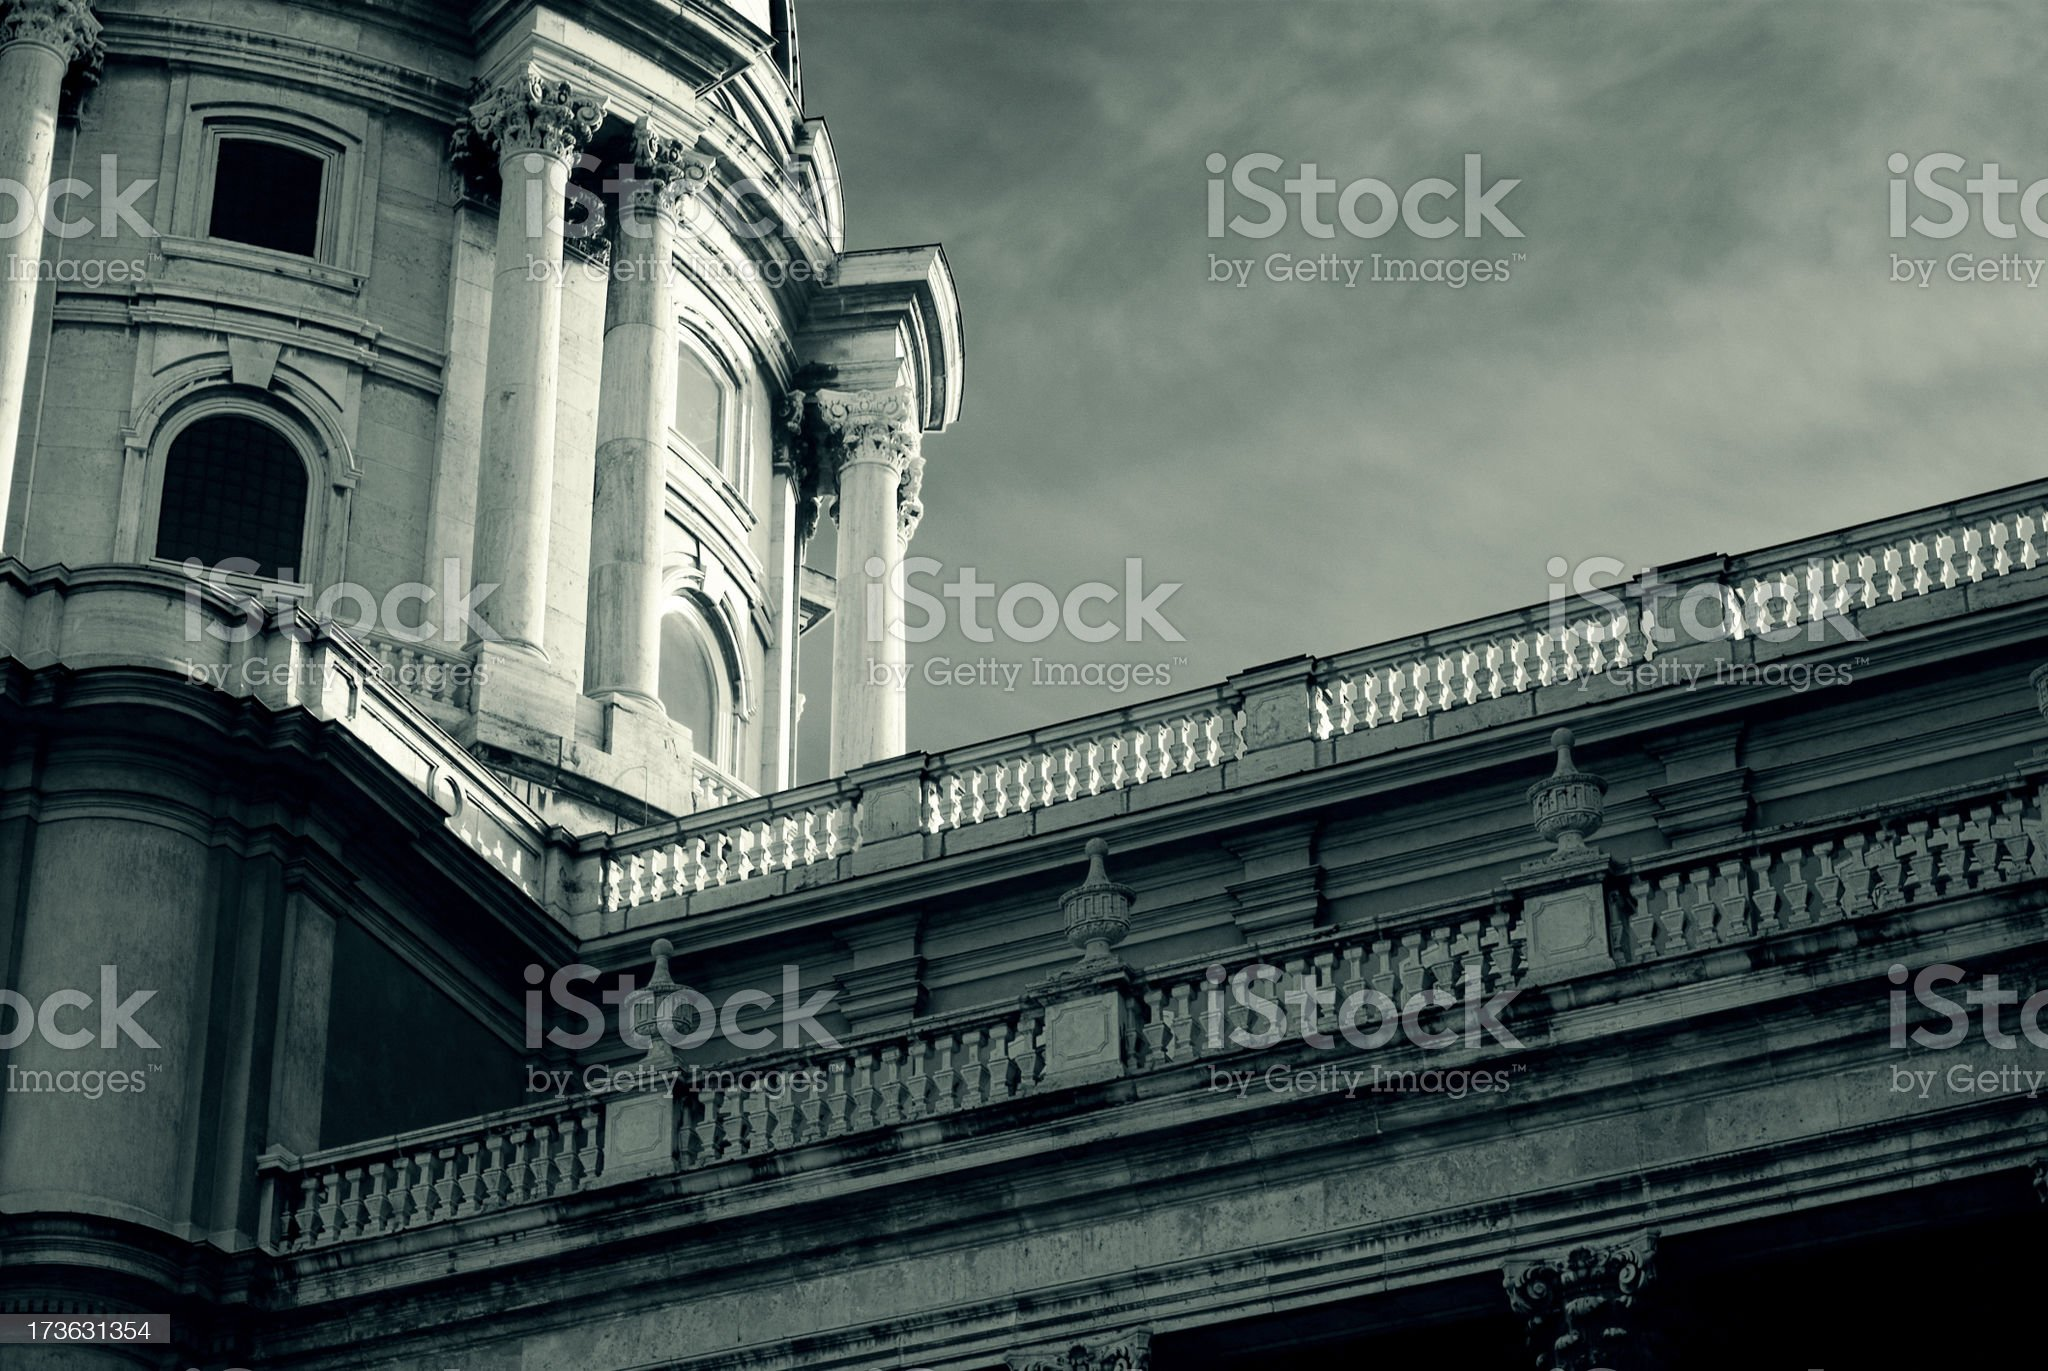 Buda castle 3 - Palace (monochrome) royalty-free stock photo